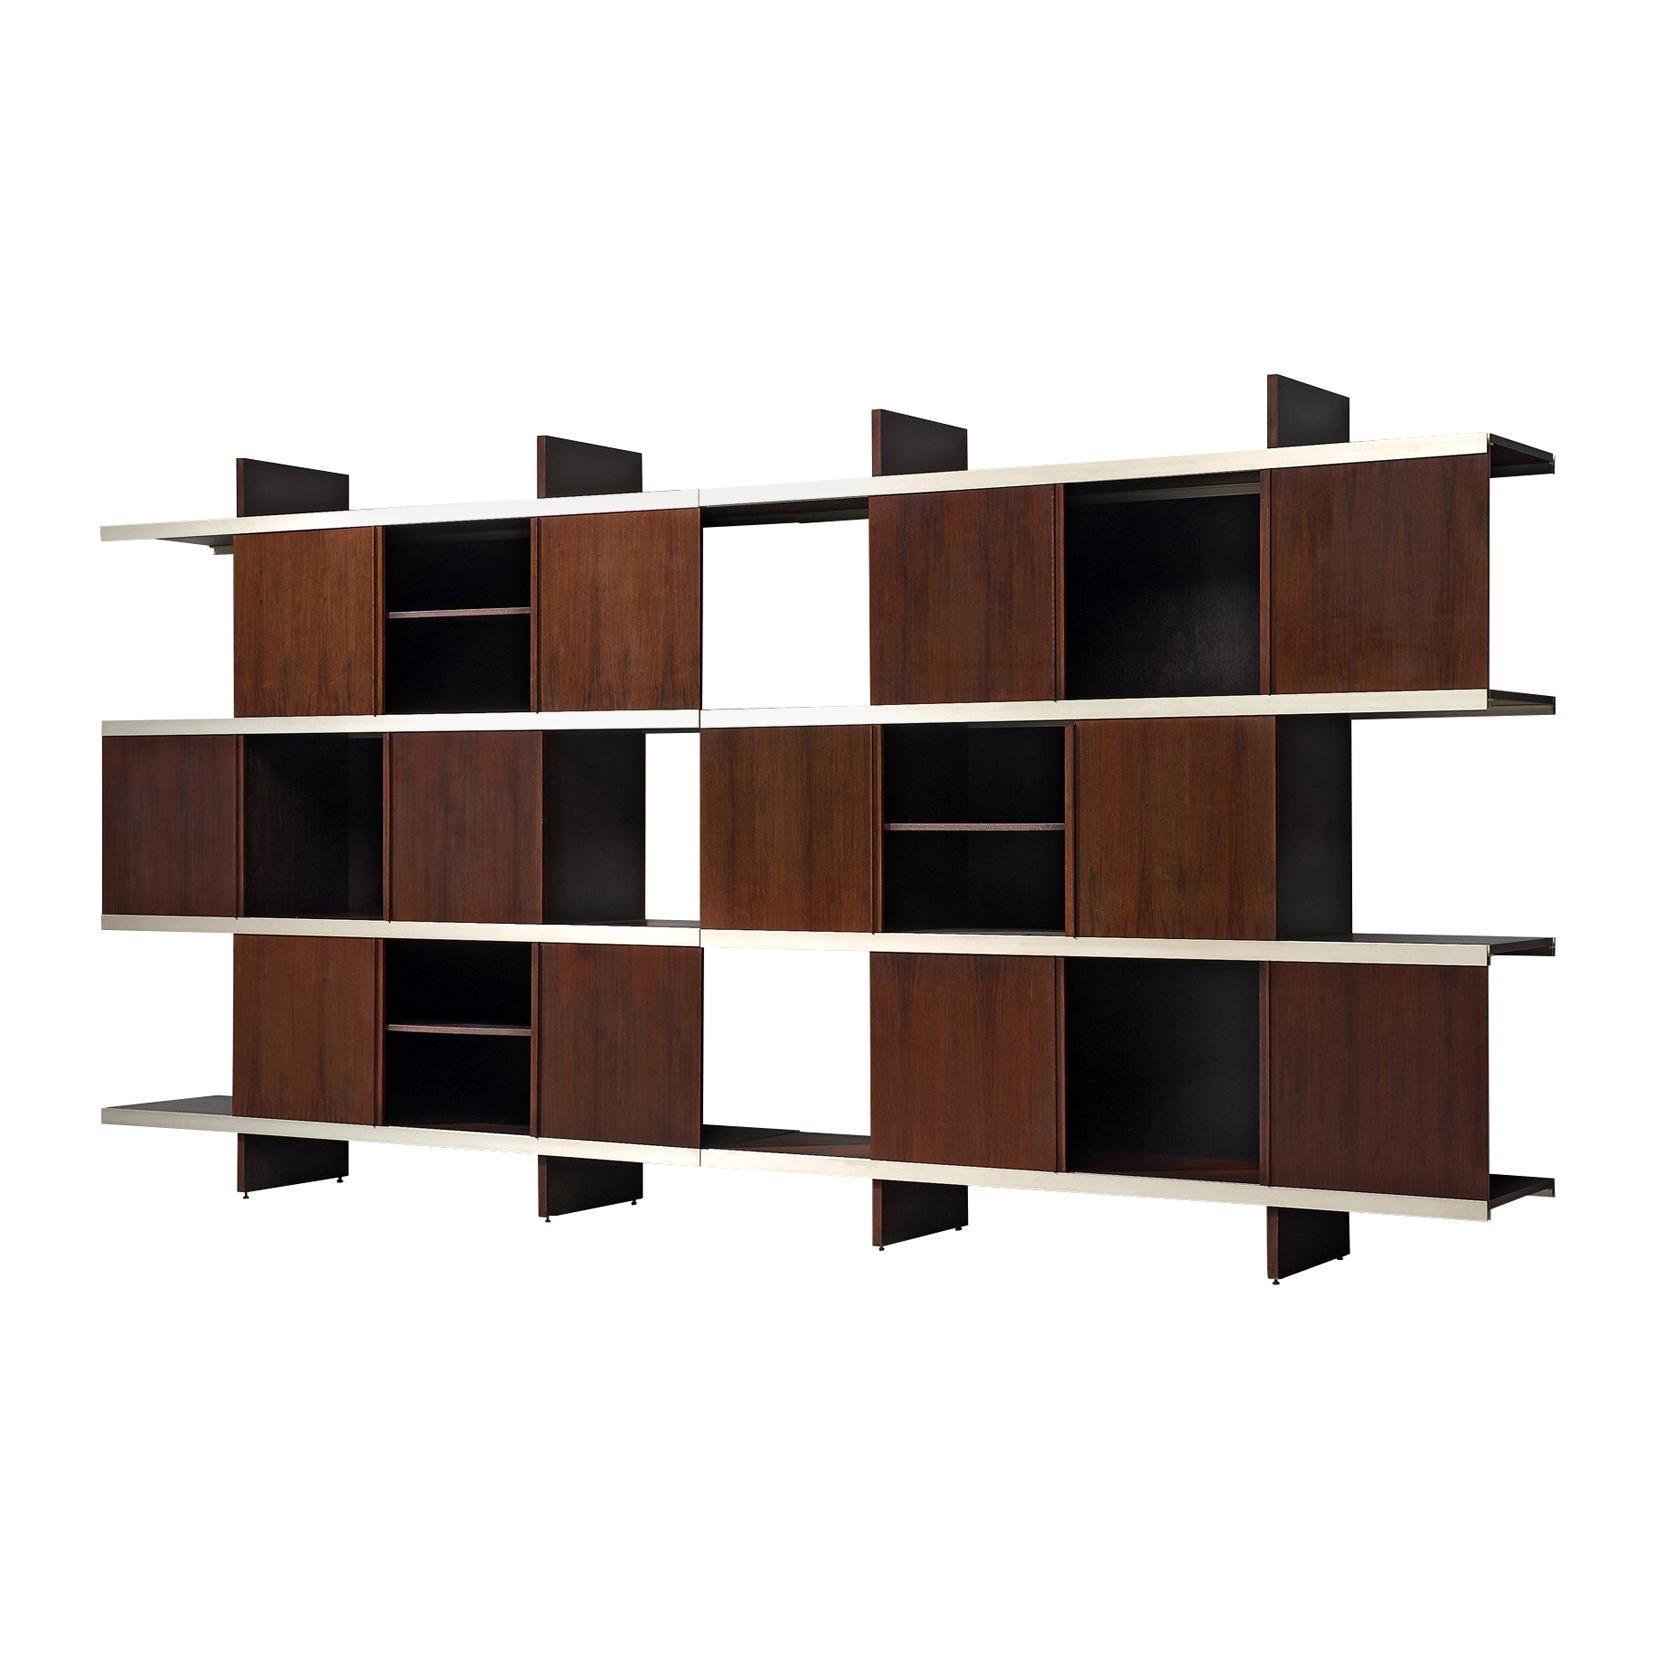 Angelo Mangiarotti Wall Unit in Wood and Aluminium